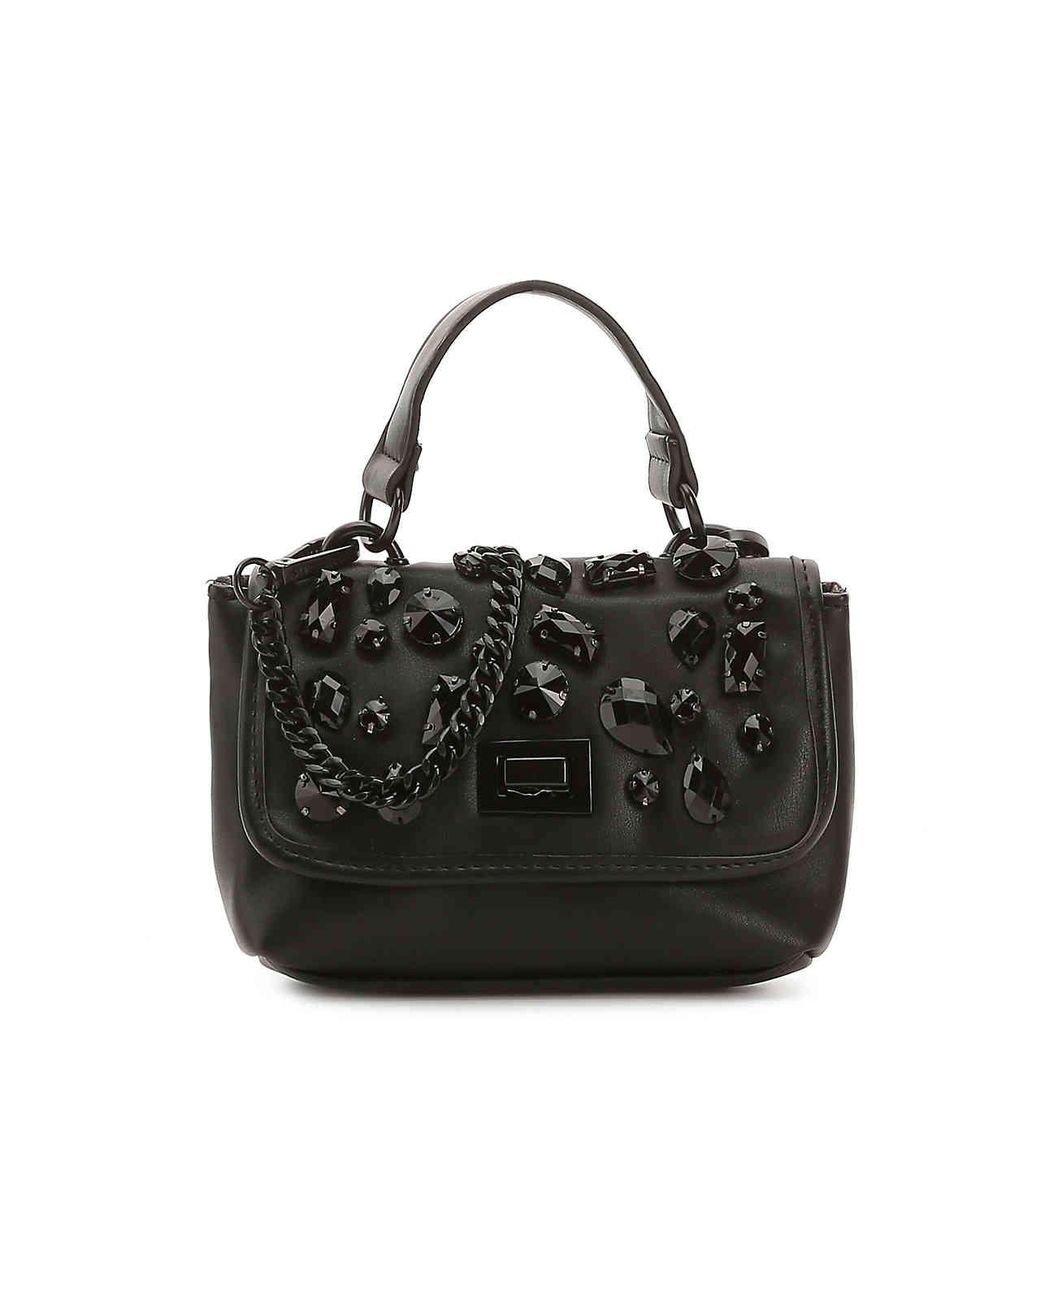 d6638dfefe5 Steve Madden Bkerri Crossbody Bag in Black - Lyst